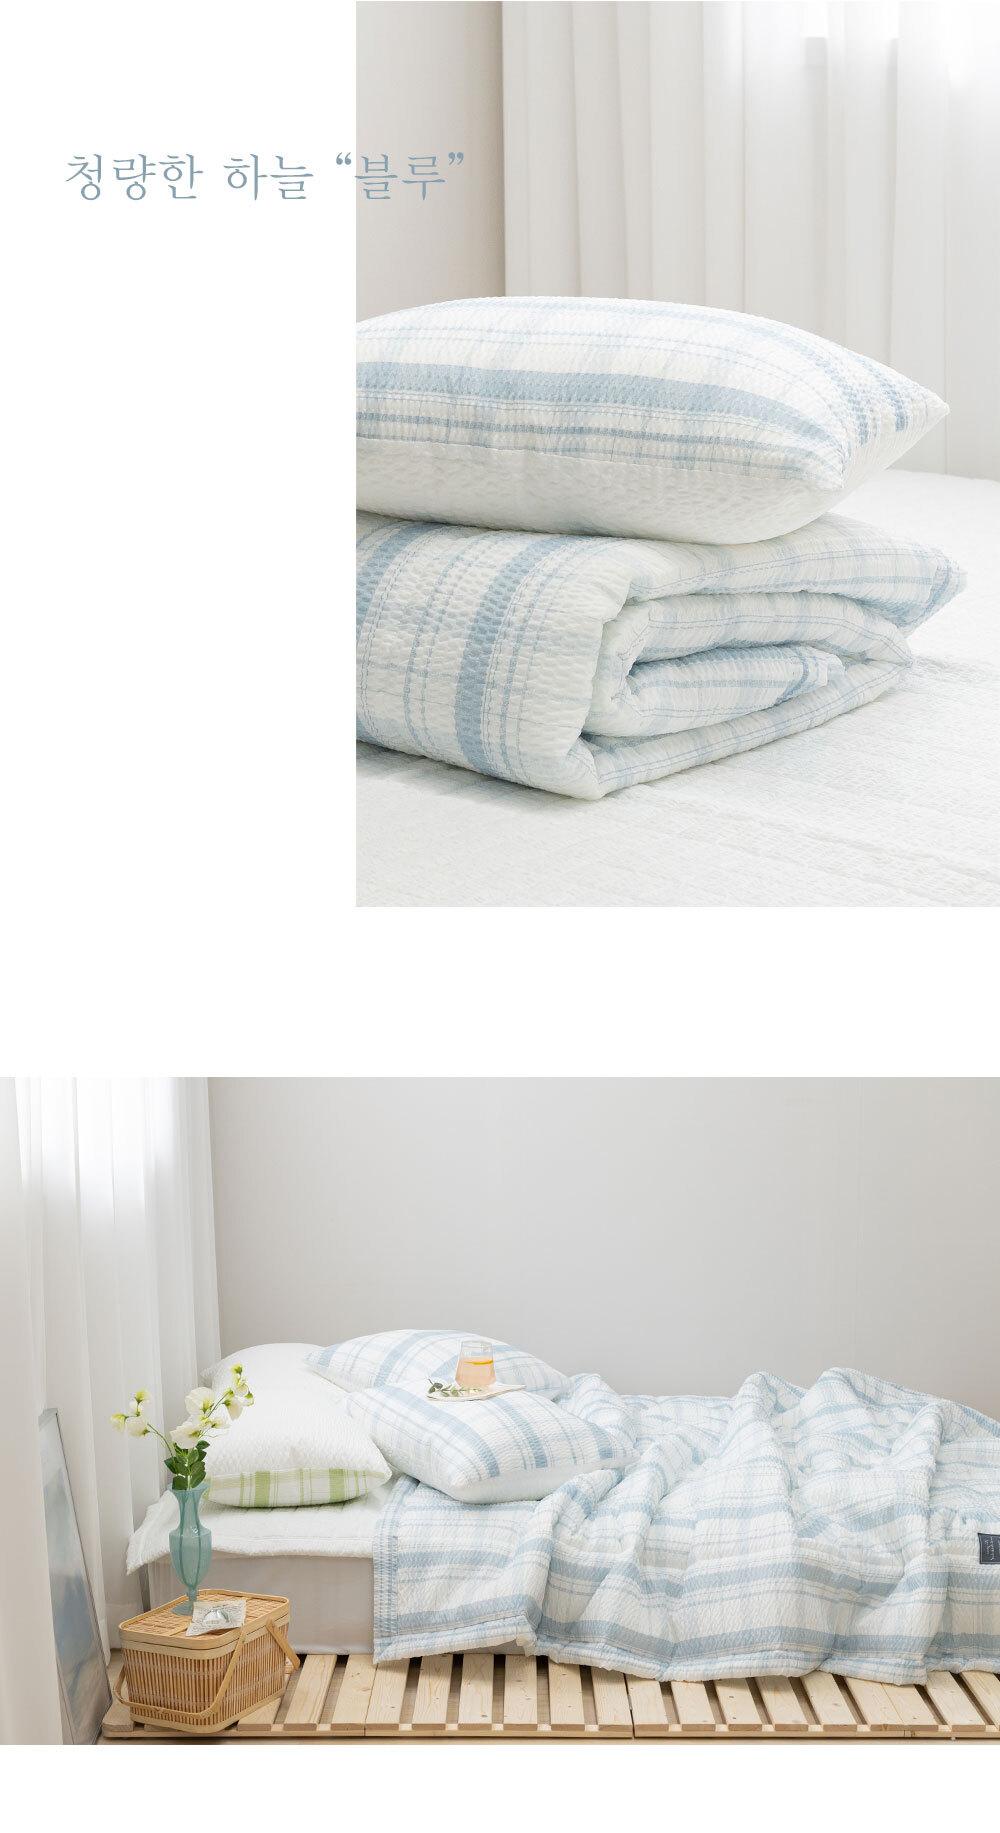 butterring_bed_blue_01.jpg